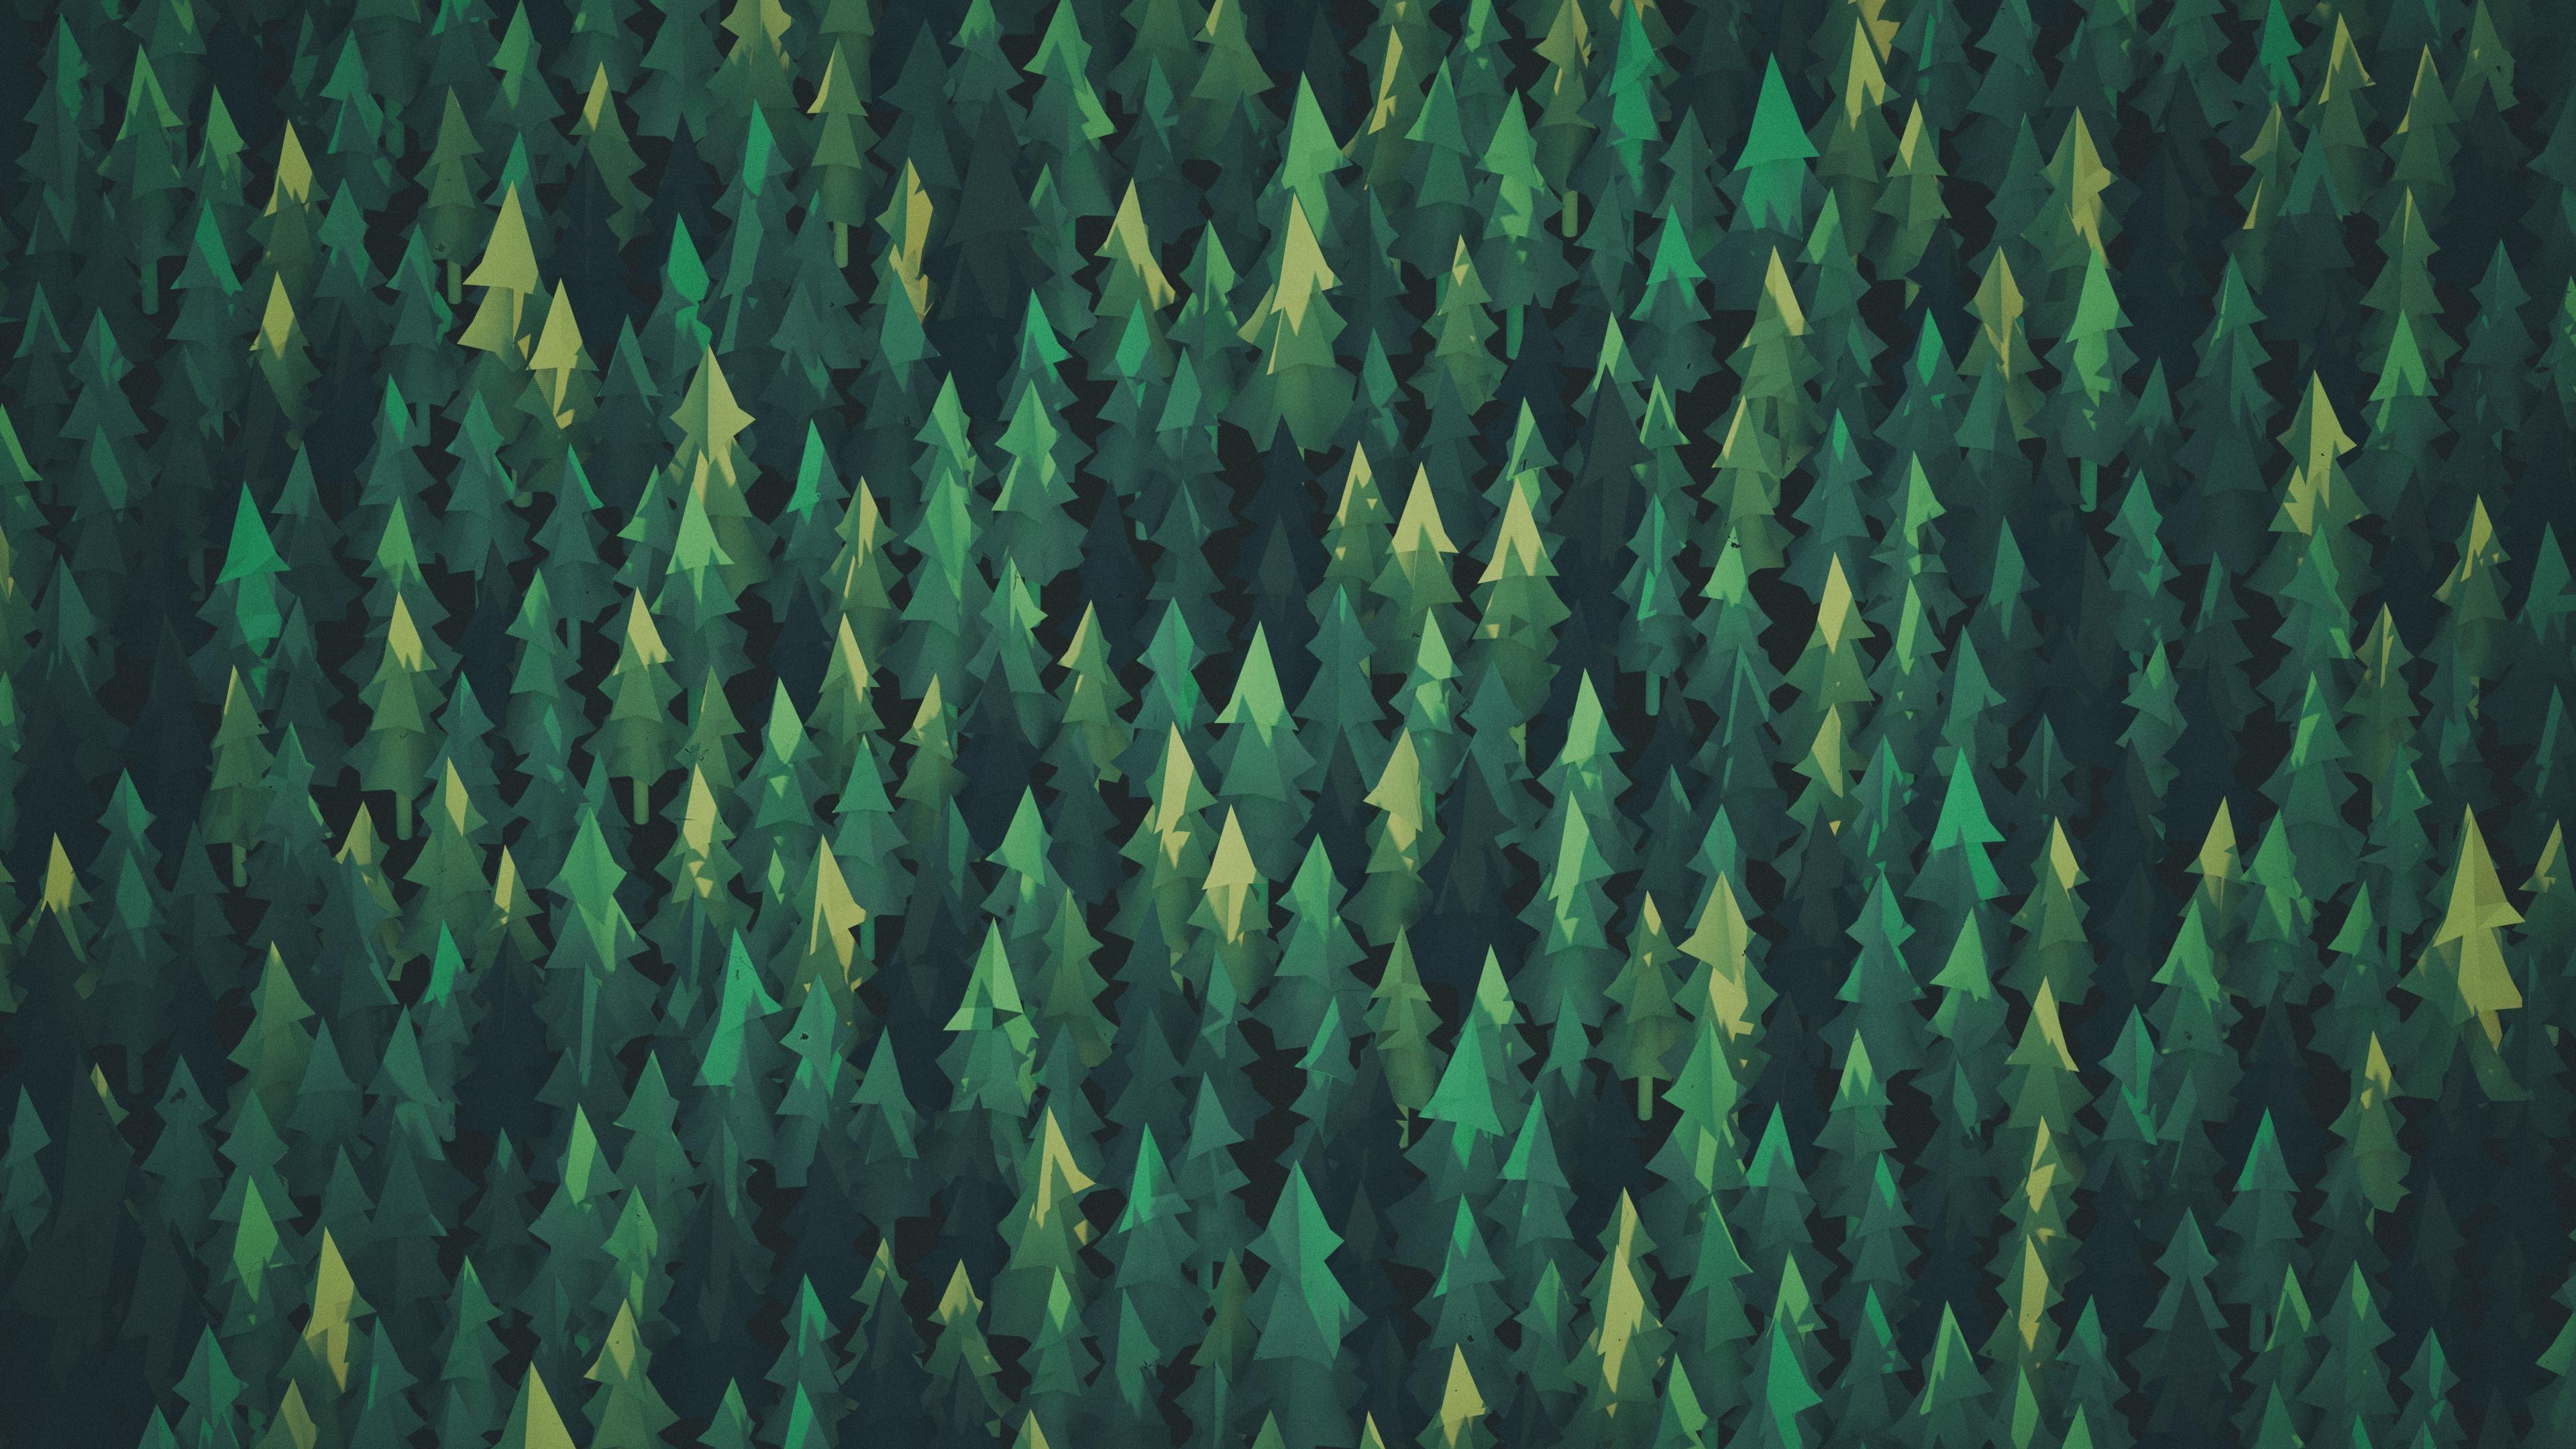 Wallpaper Trees Forest Digital Art Nature Reflection